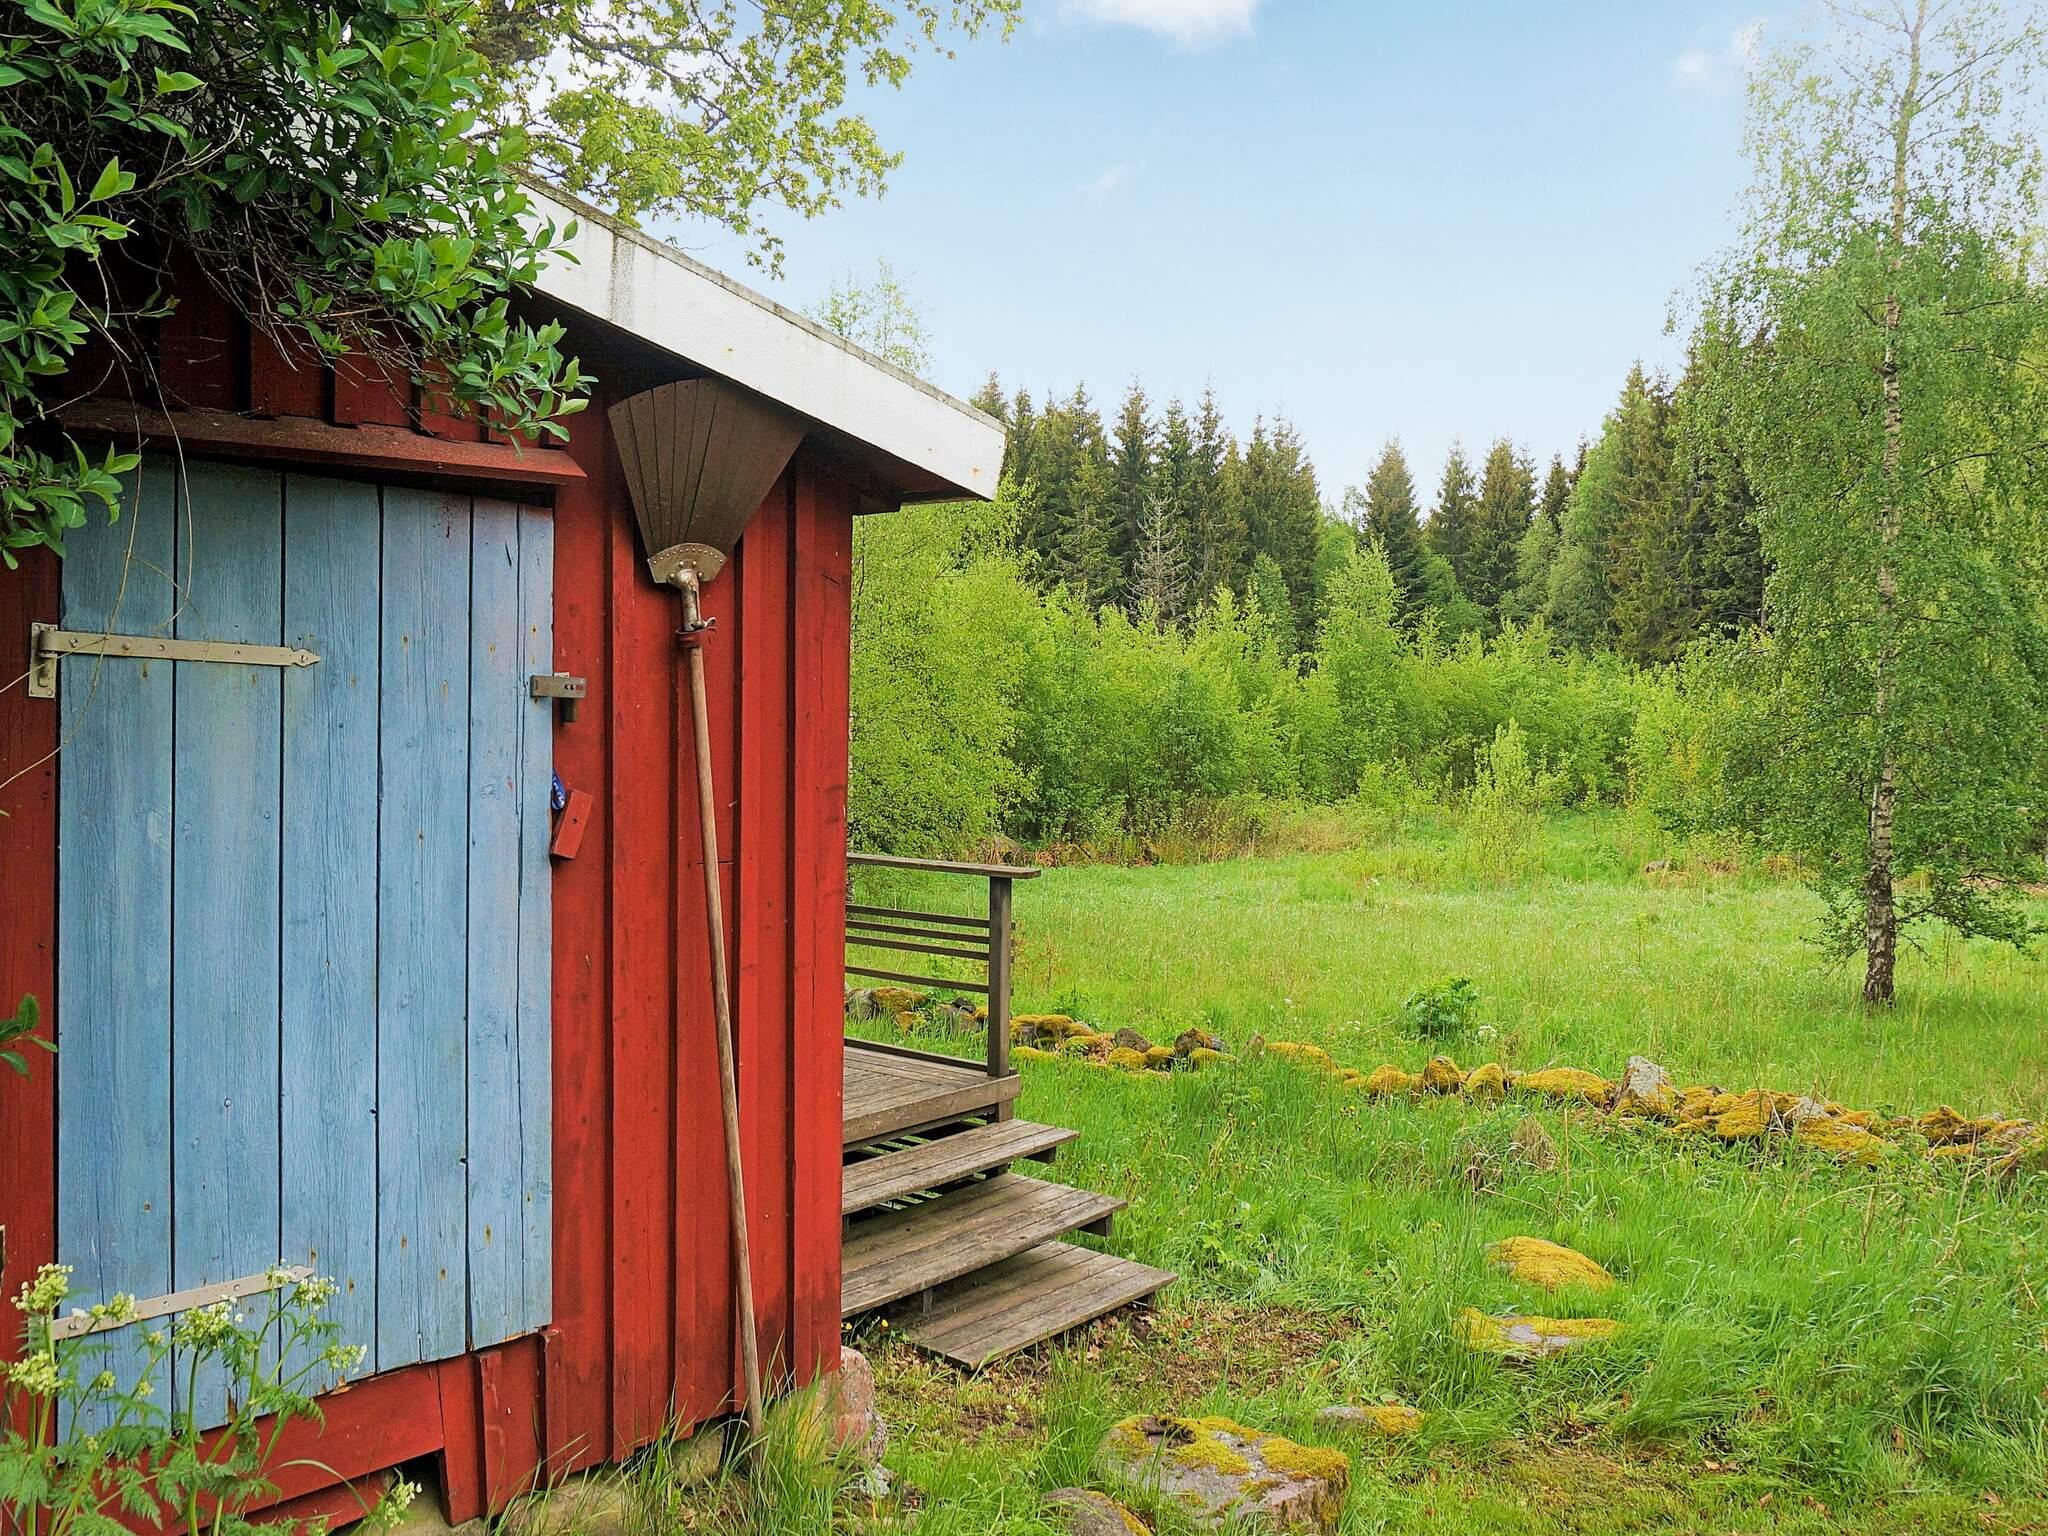 Ferienhaus Falköping (2636837), Trädet, Västra Götaland län, Westschweden, Schweden, Bild 31